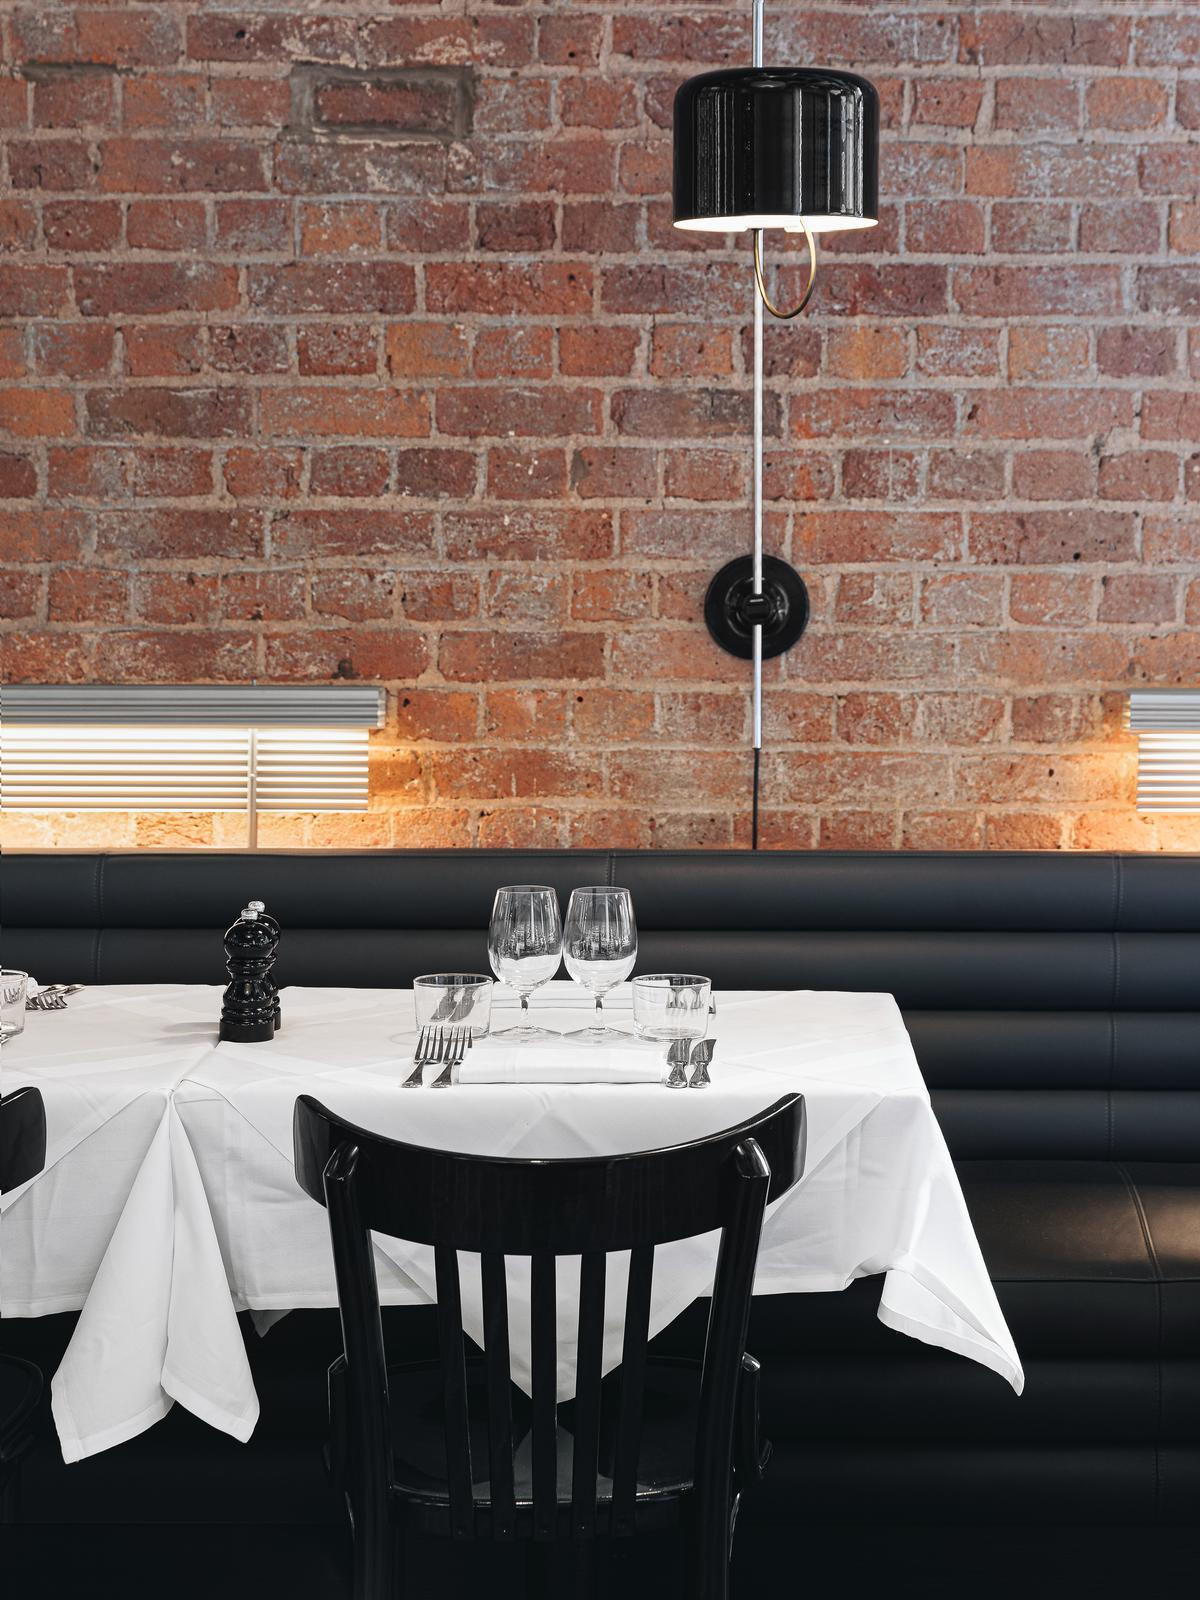 Bistrotheque has an 'expansive open kitchen' / Cultureplex